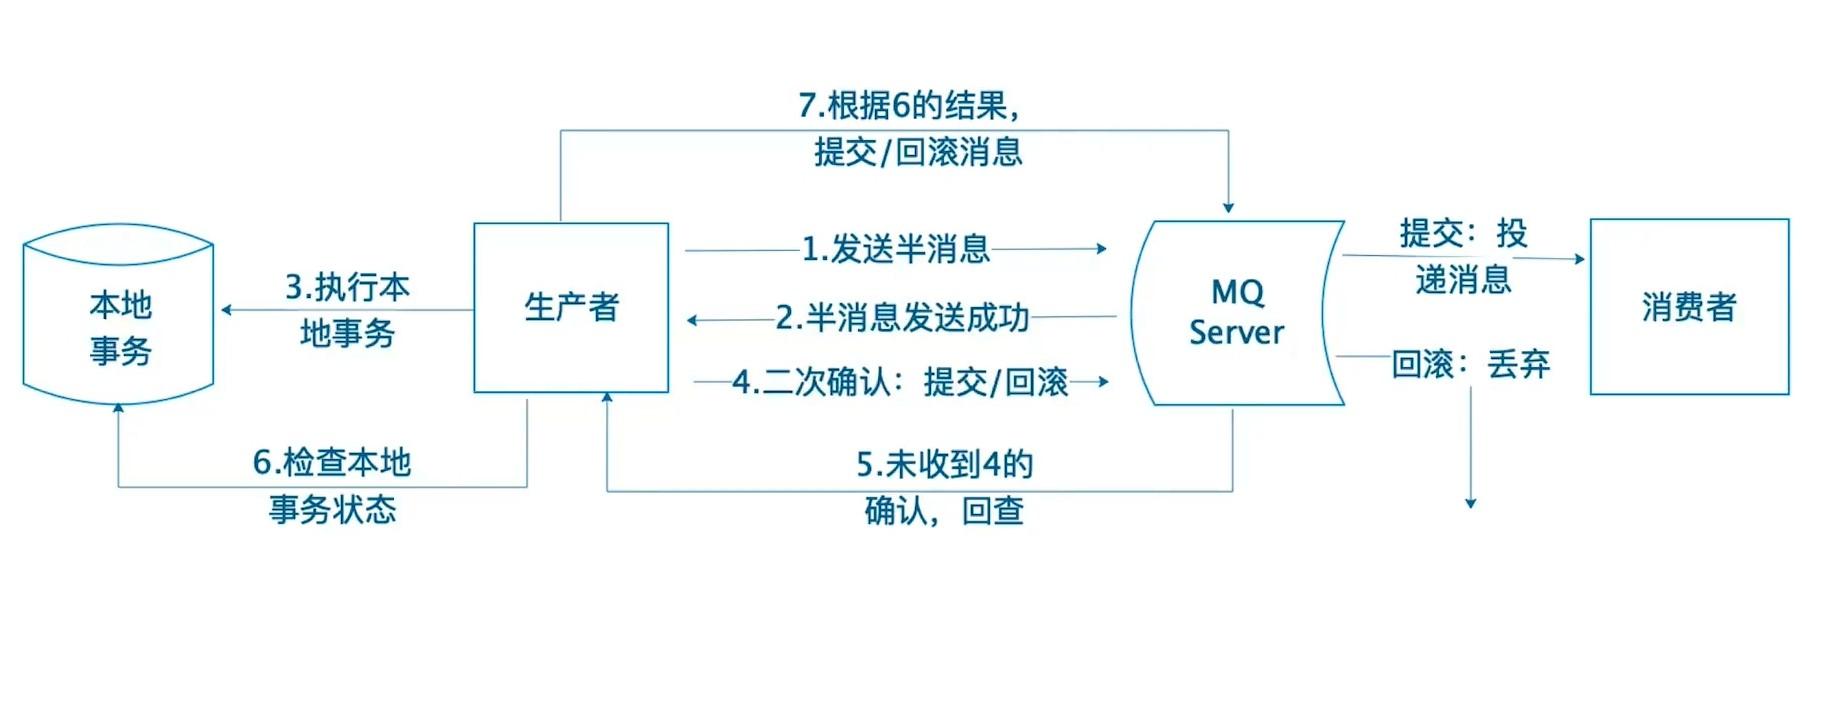 RocketMQ 分布式事务实现原理.jpg